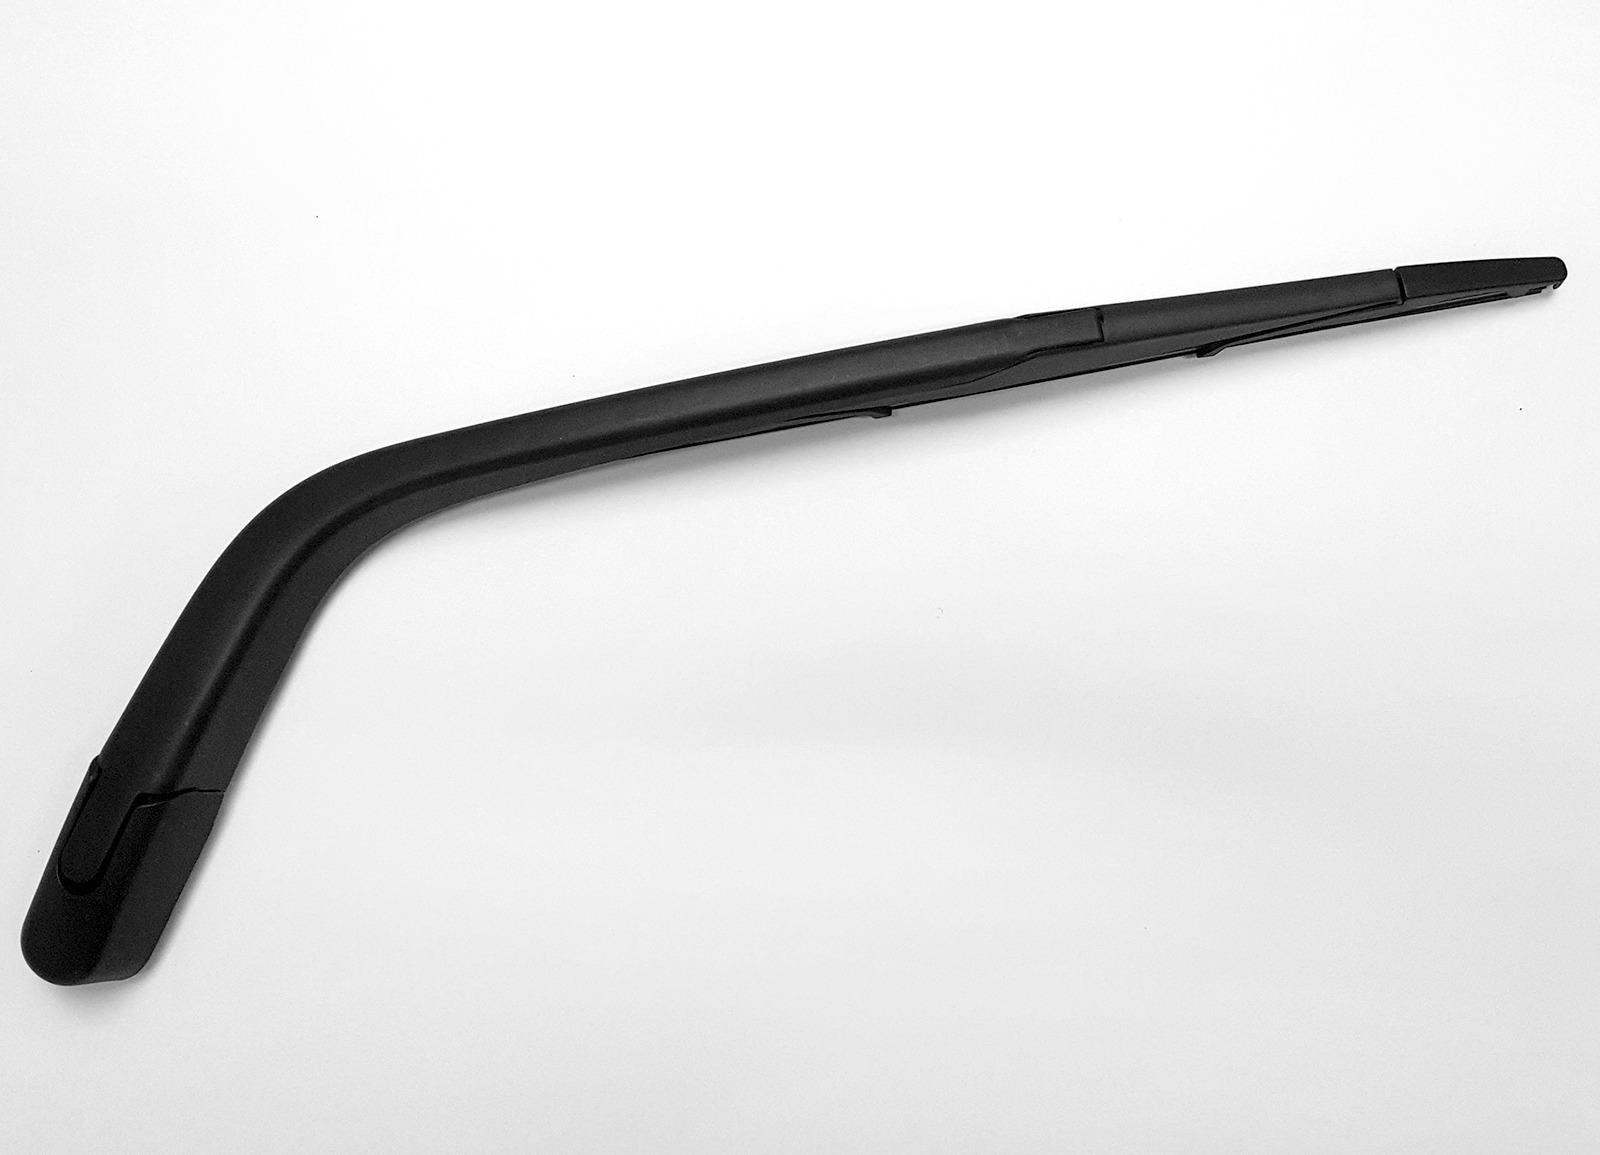 Rear Car Wiper Blade + Arm CITRA-108 fit Hyundai i10 2008 to